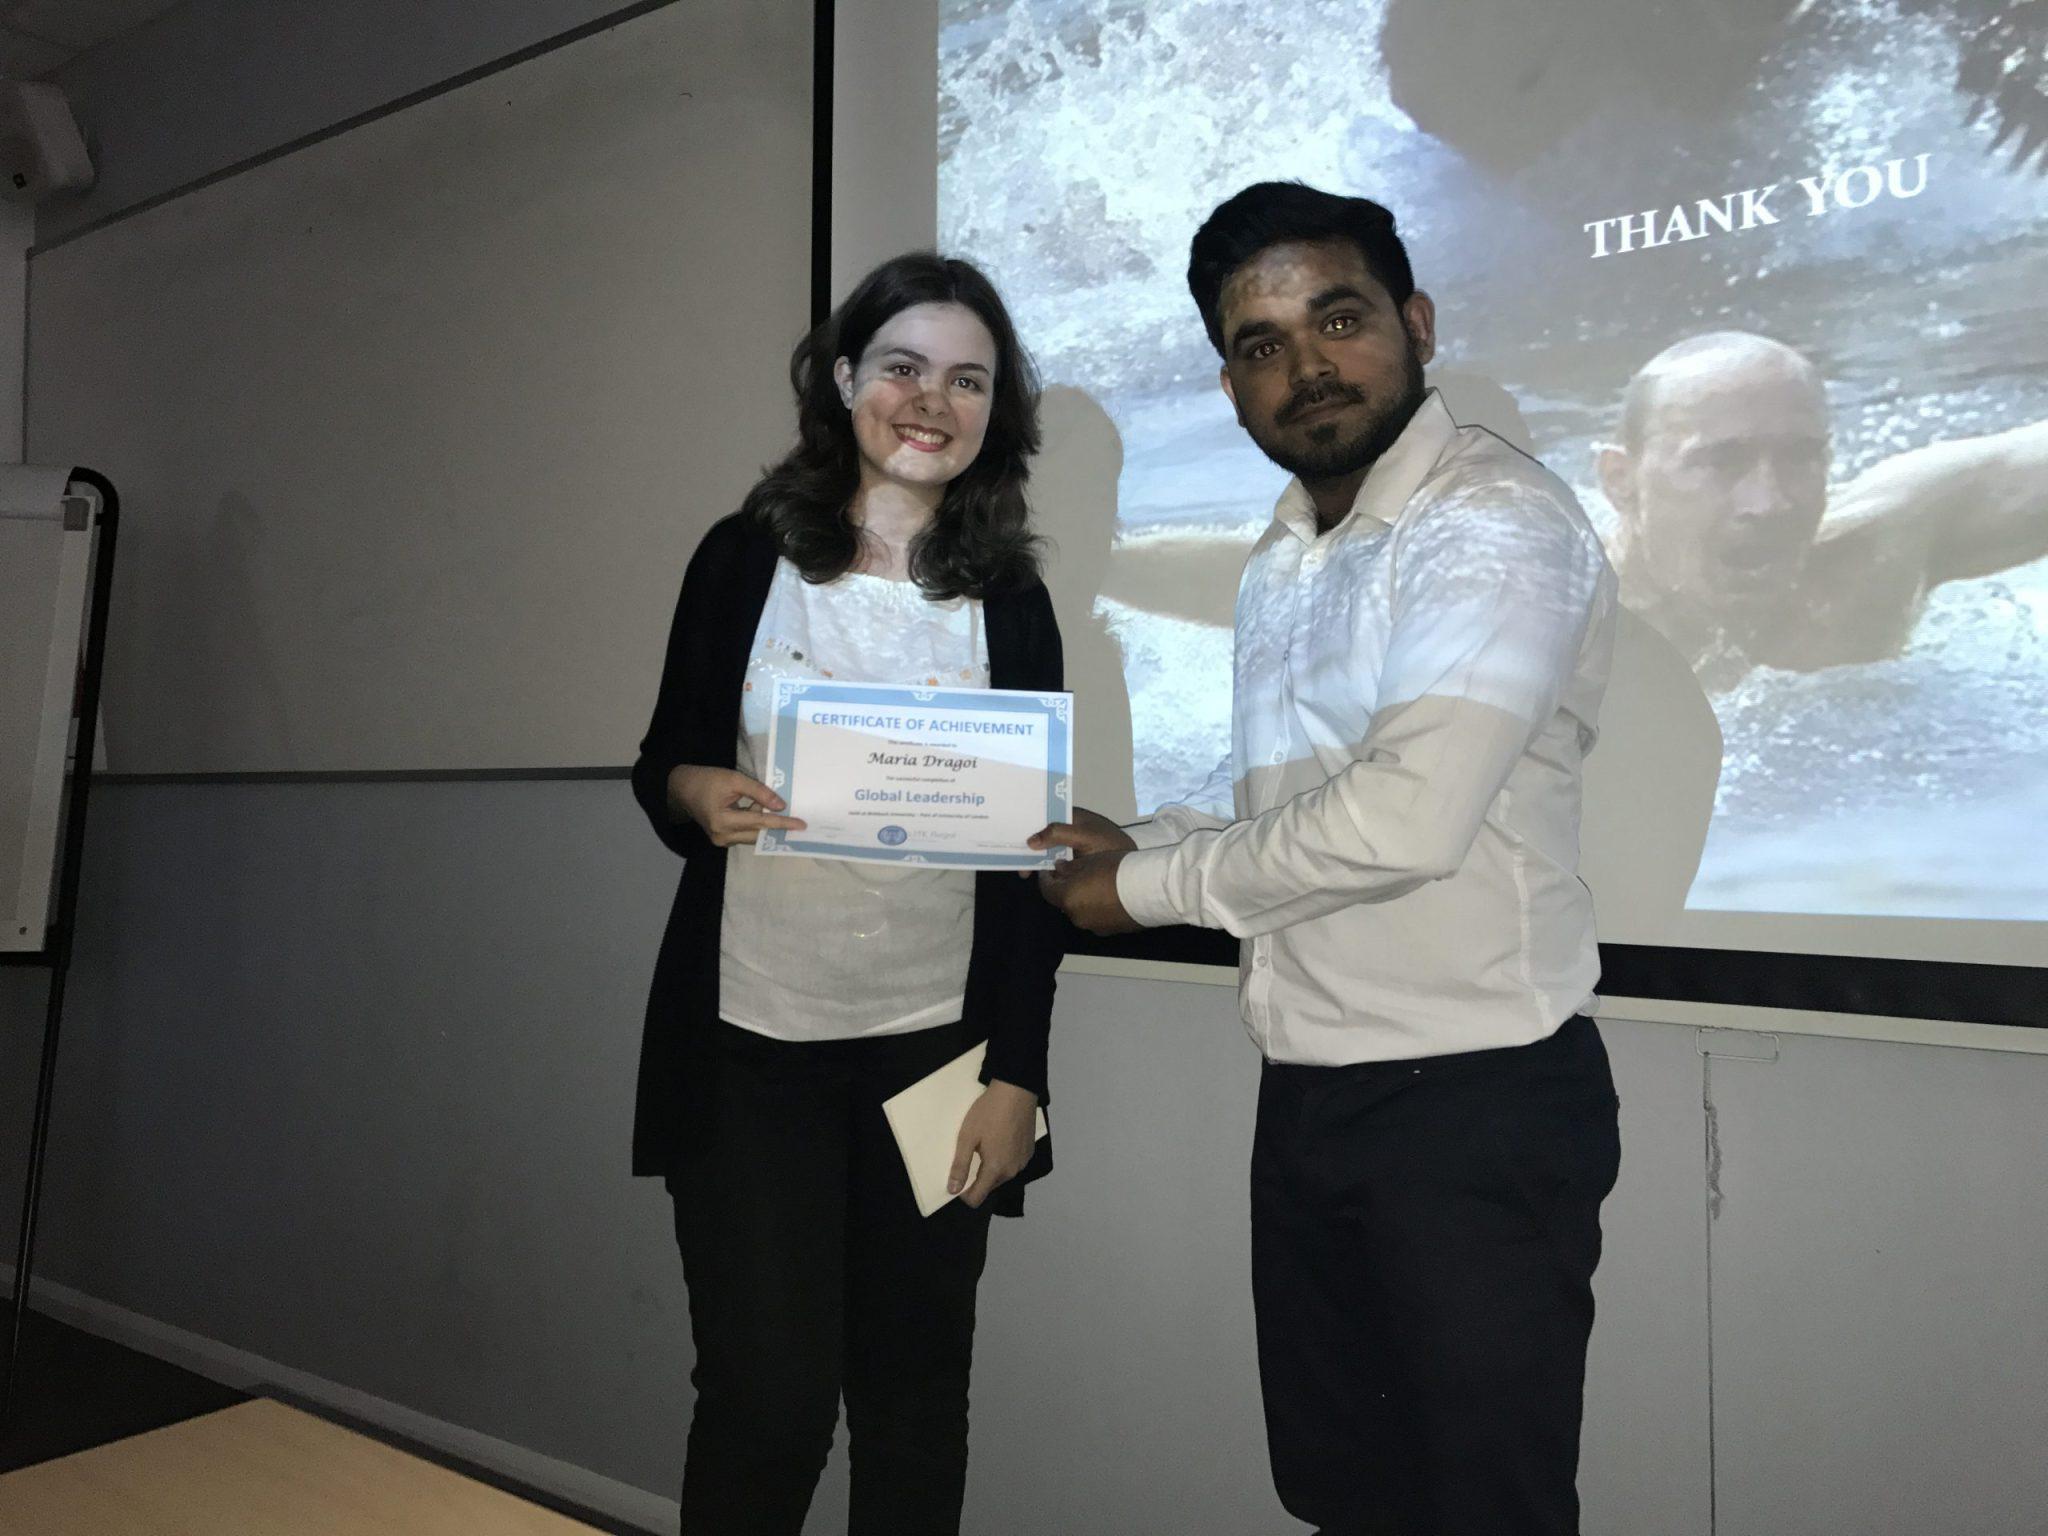 Global Leadership Certificate - Maria D from Lite Regal Education